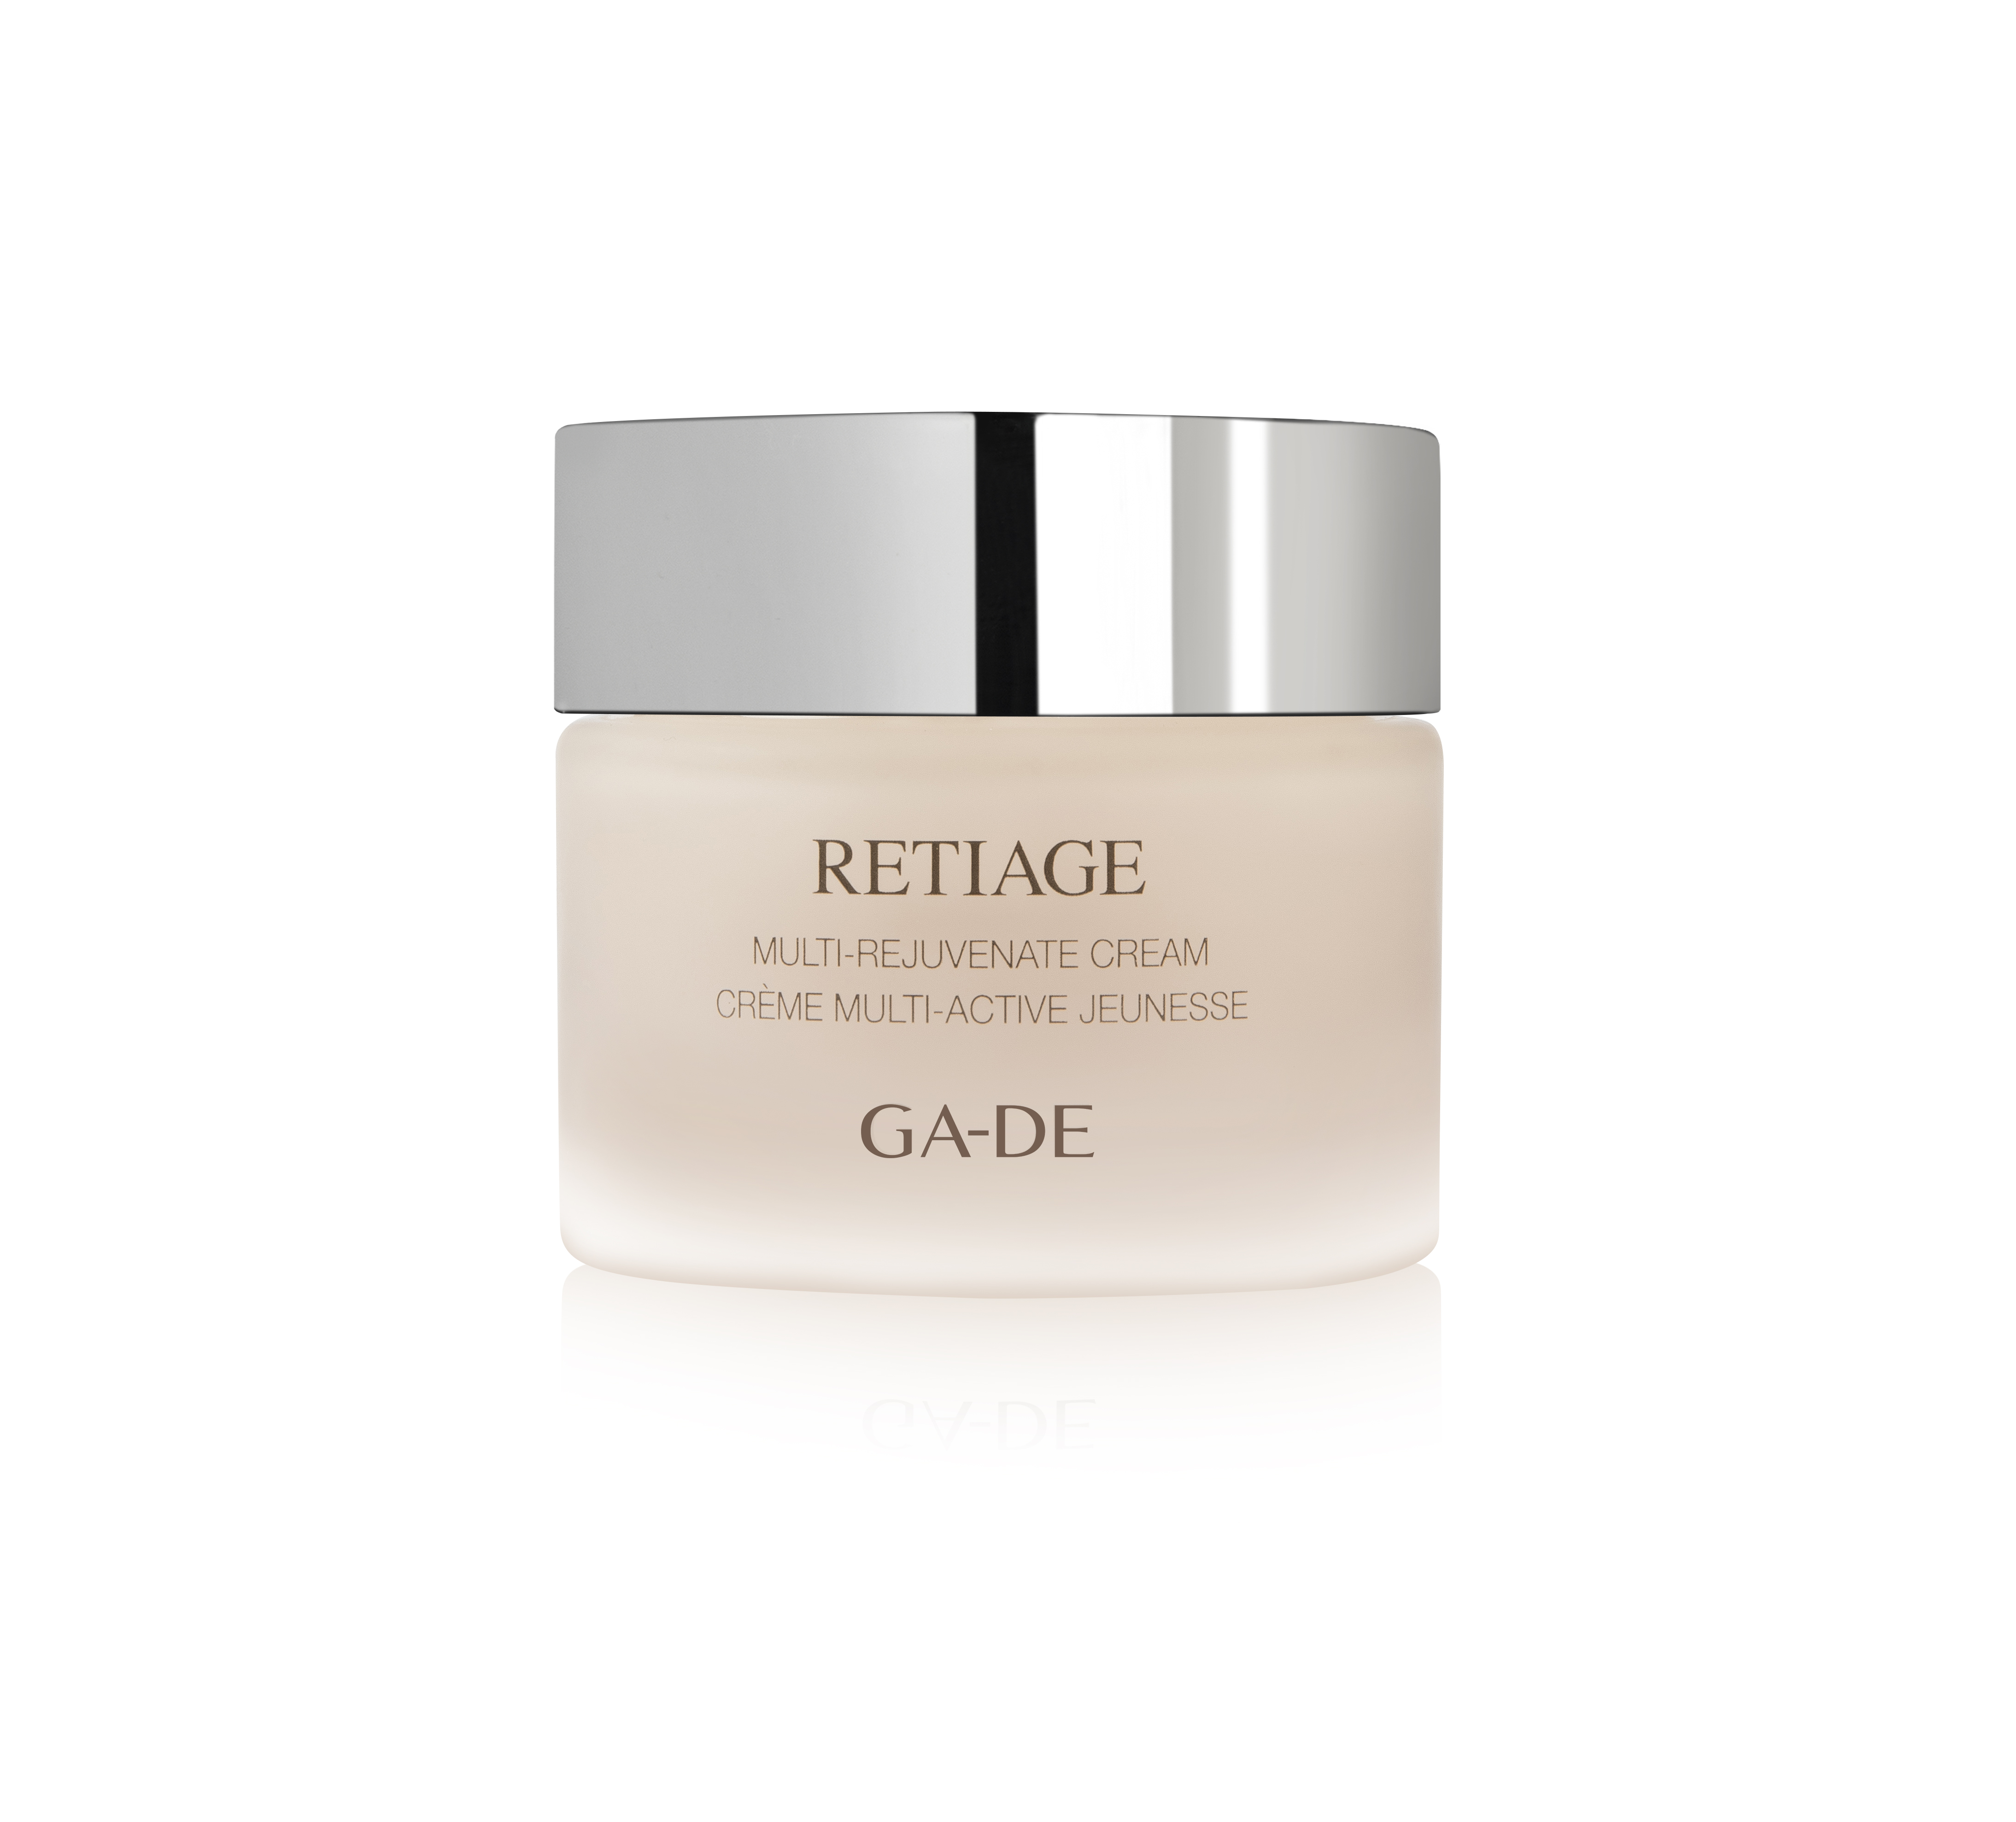 Мульти - омолаживающий крем для сухой кожи  - RETIAGE multi-rejuvenate cream